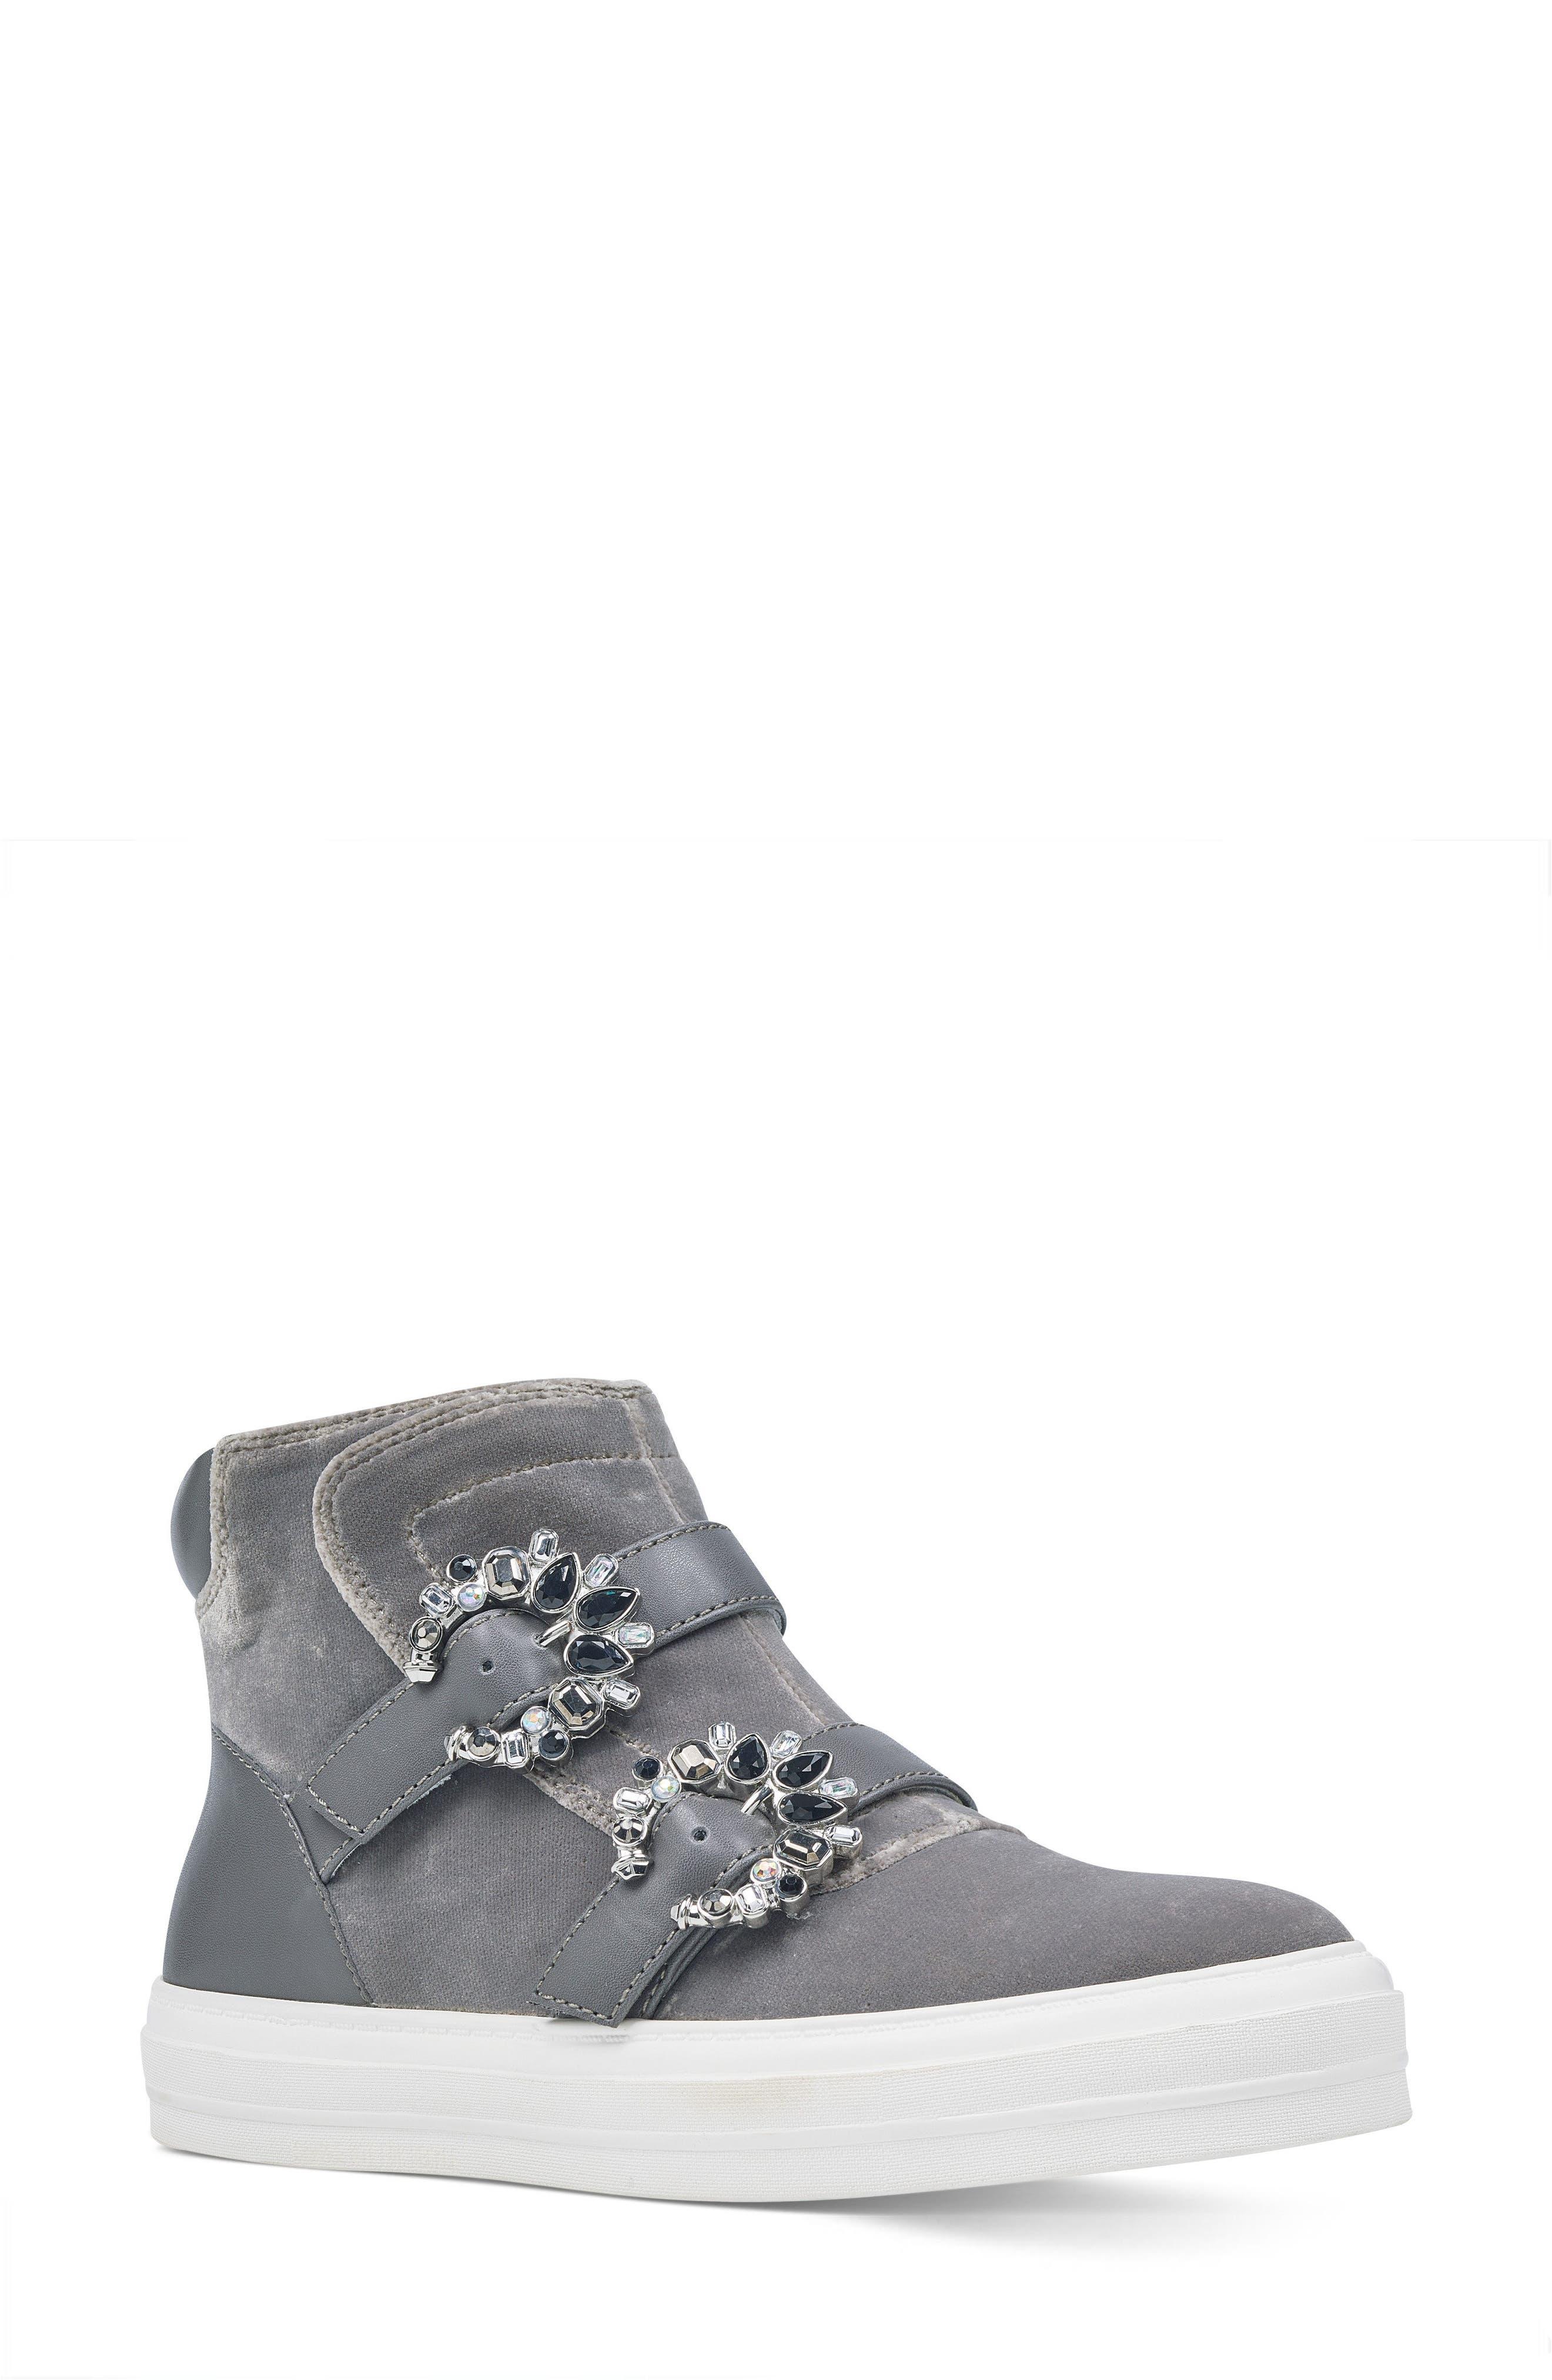 Alternate Image 1 Selected - Nine West Orisna High Top Sneaker (Women)